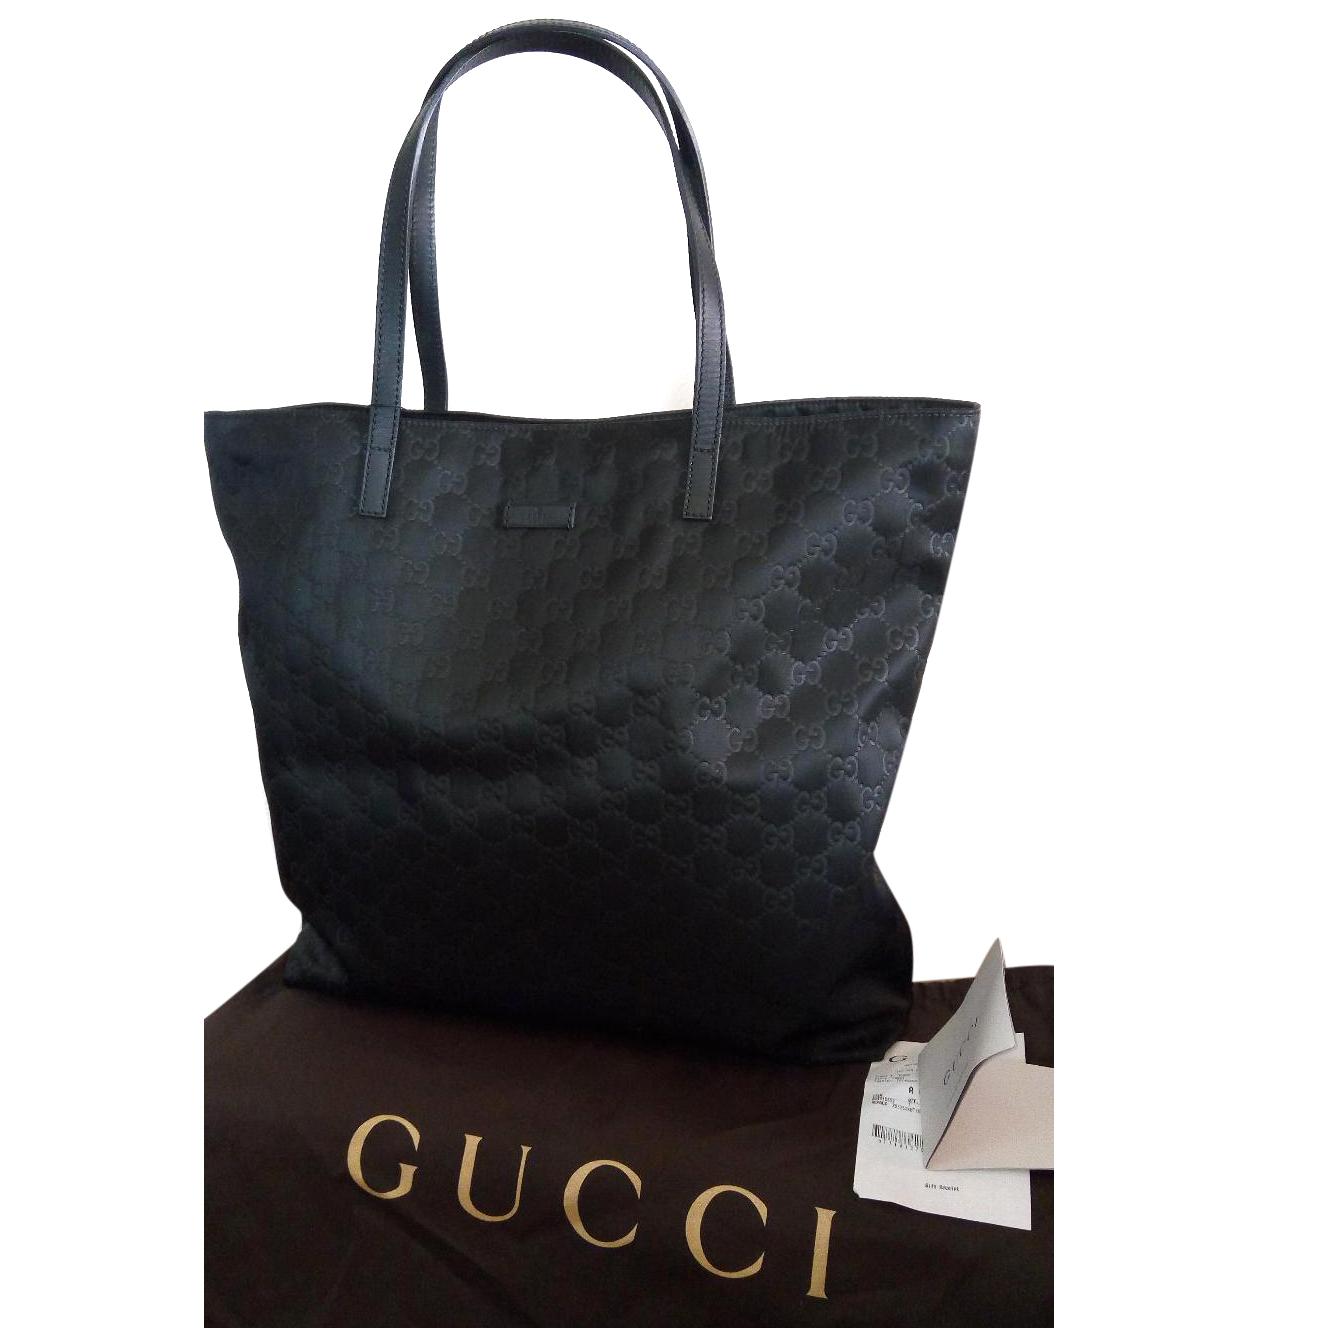 3c33900eaf89fa Gucci Nylon Gg Guccissima Xl Tote Bag101682   HEWI London